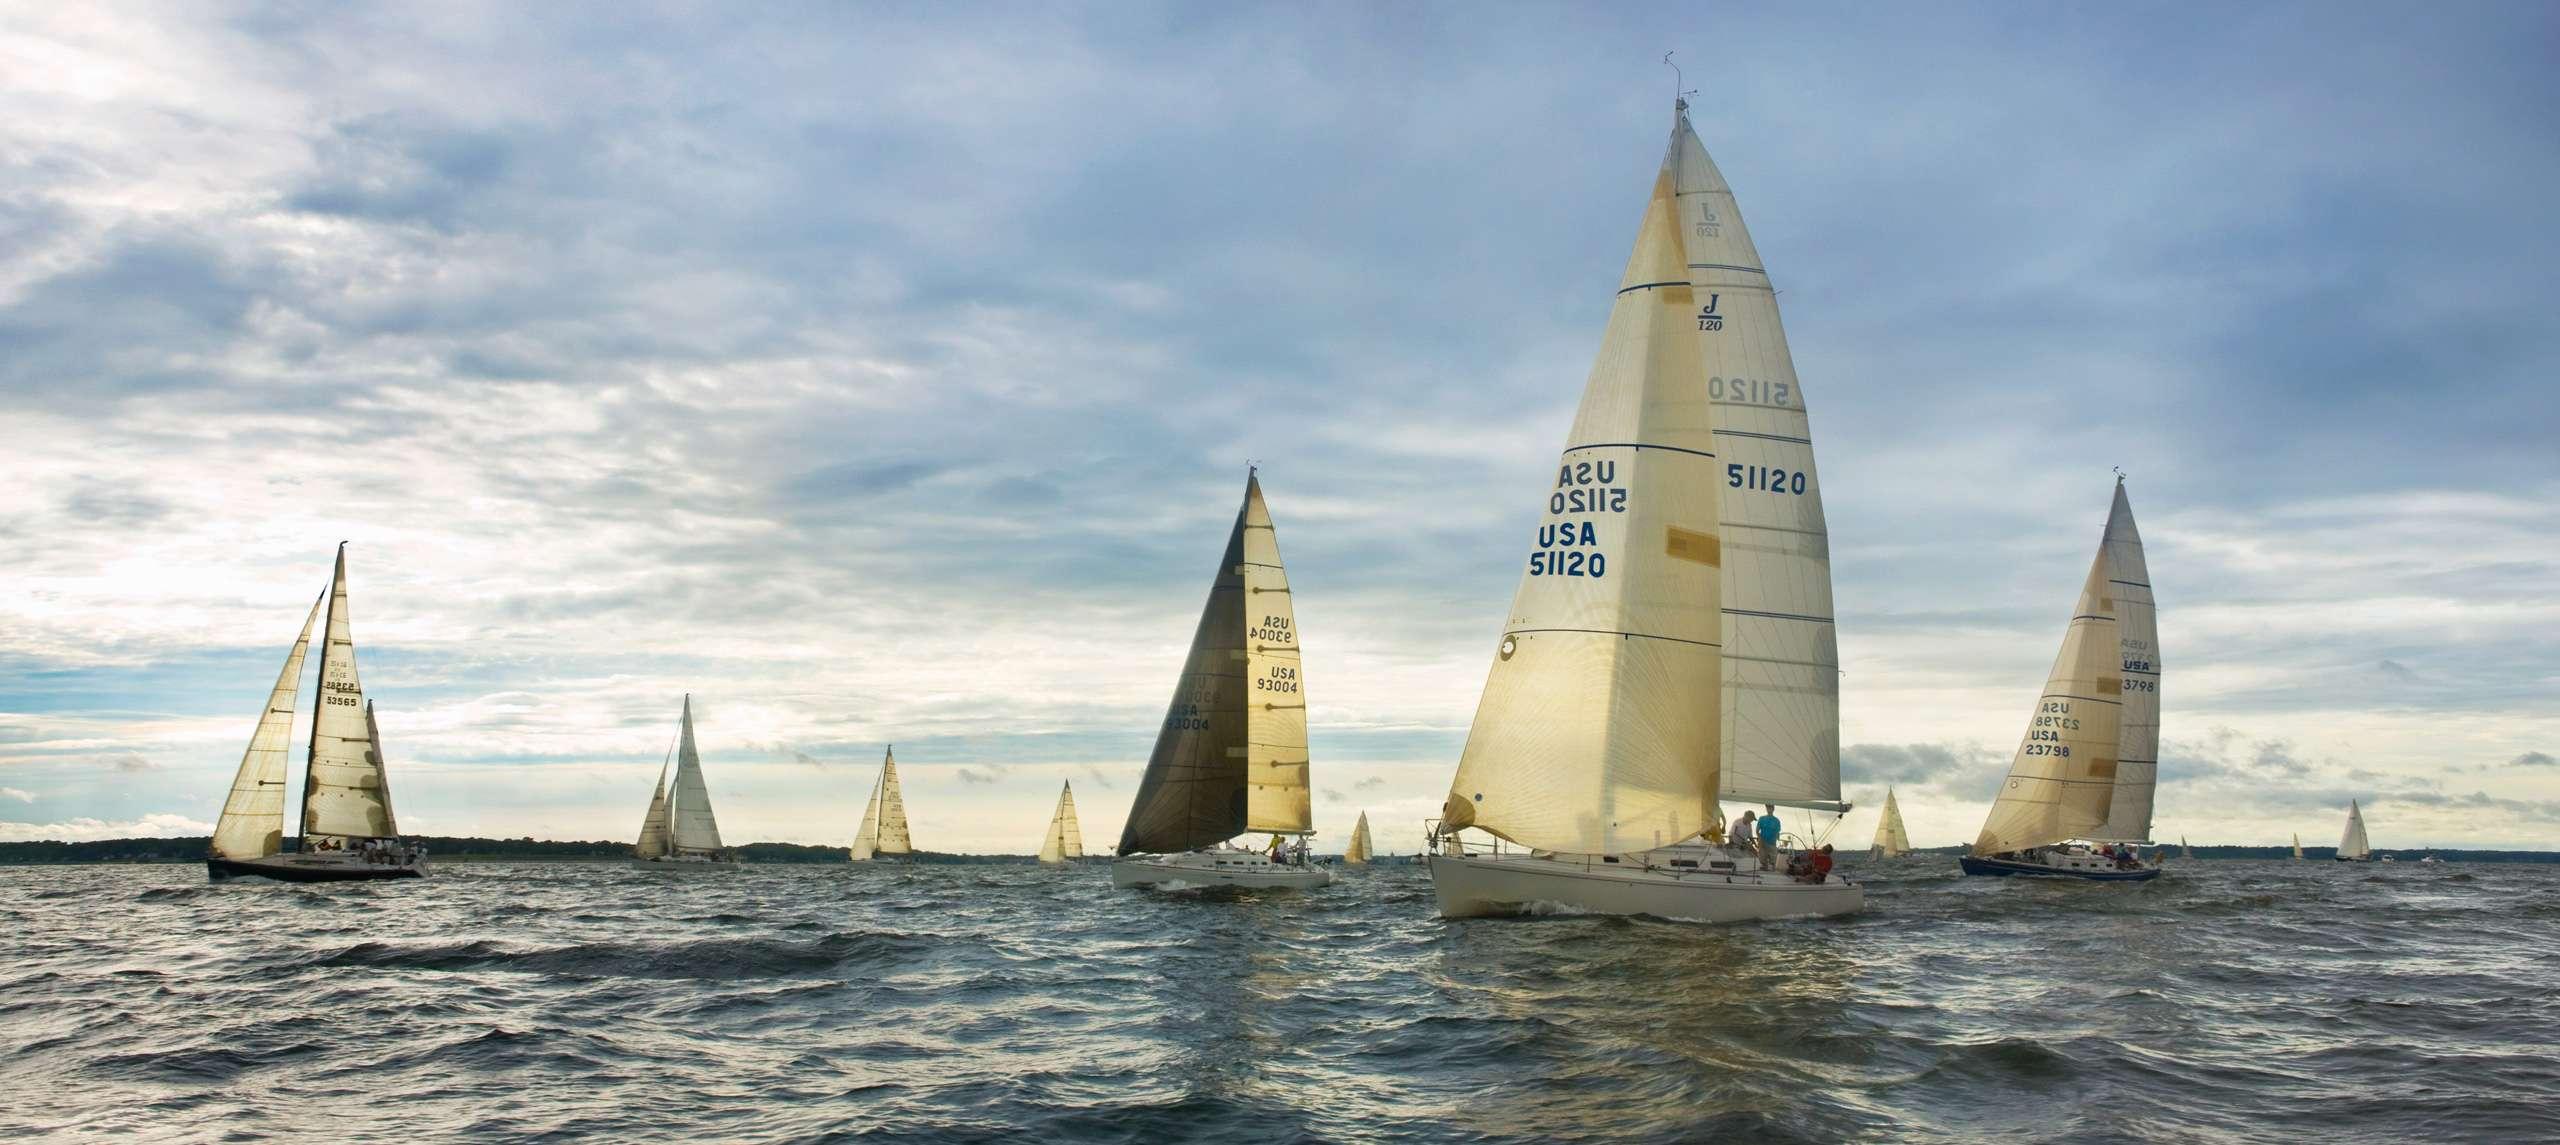 PORTFOLIO - Sailing - Chesapeake #23    PCG425